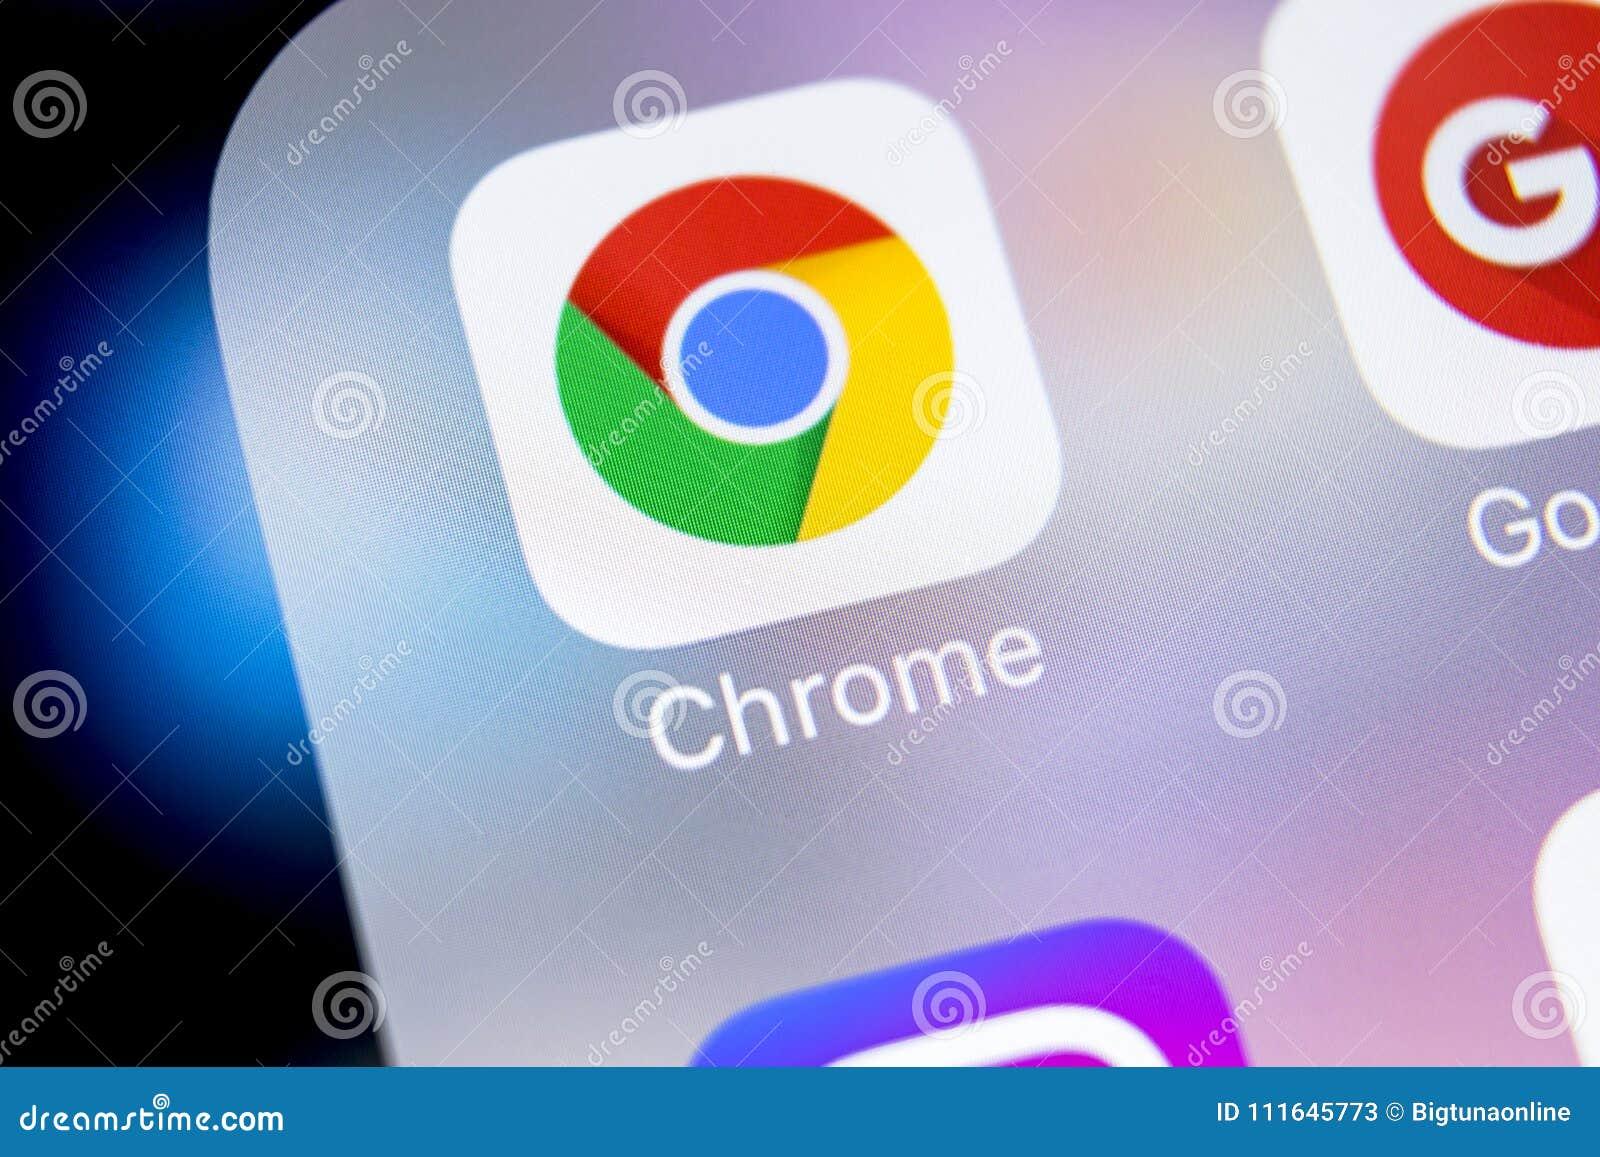 Google Chrome Application Icon On Apple IPhone X Screen